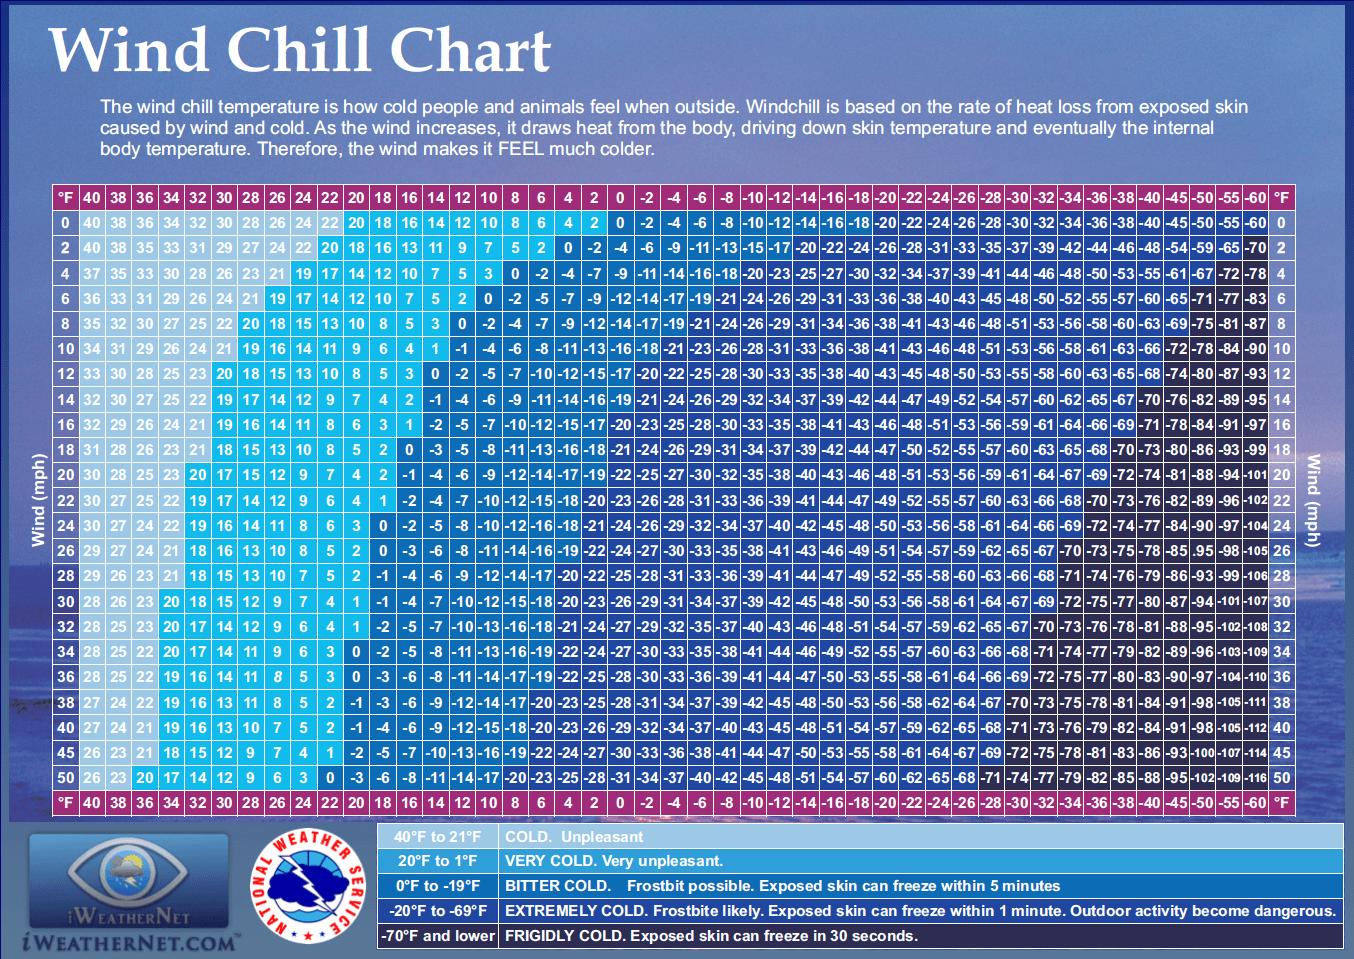 Wind Chill In Texas Dfw Amp Wind Chill Calculator Iweathernet